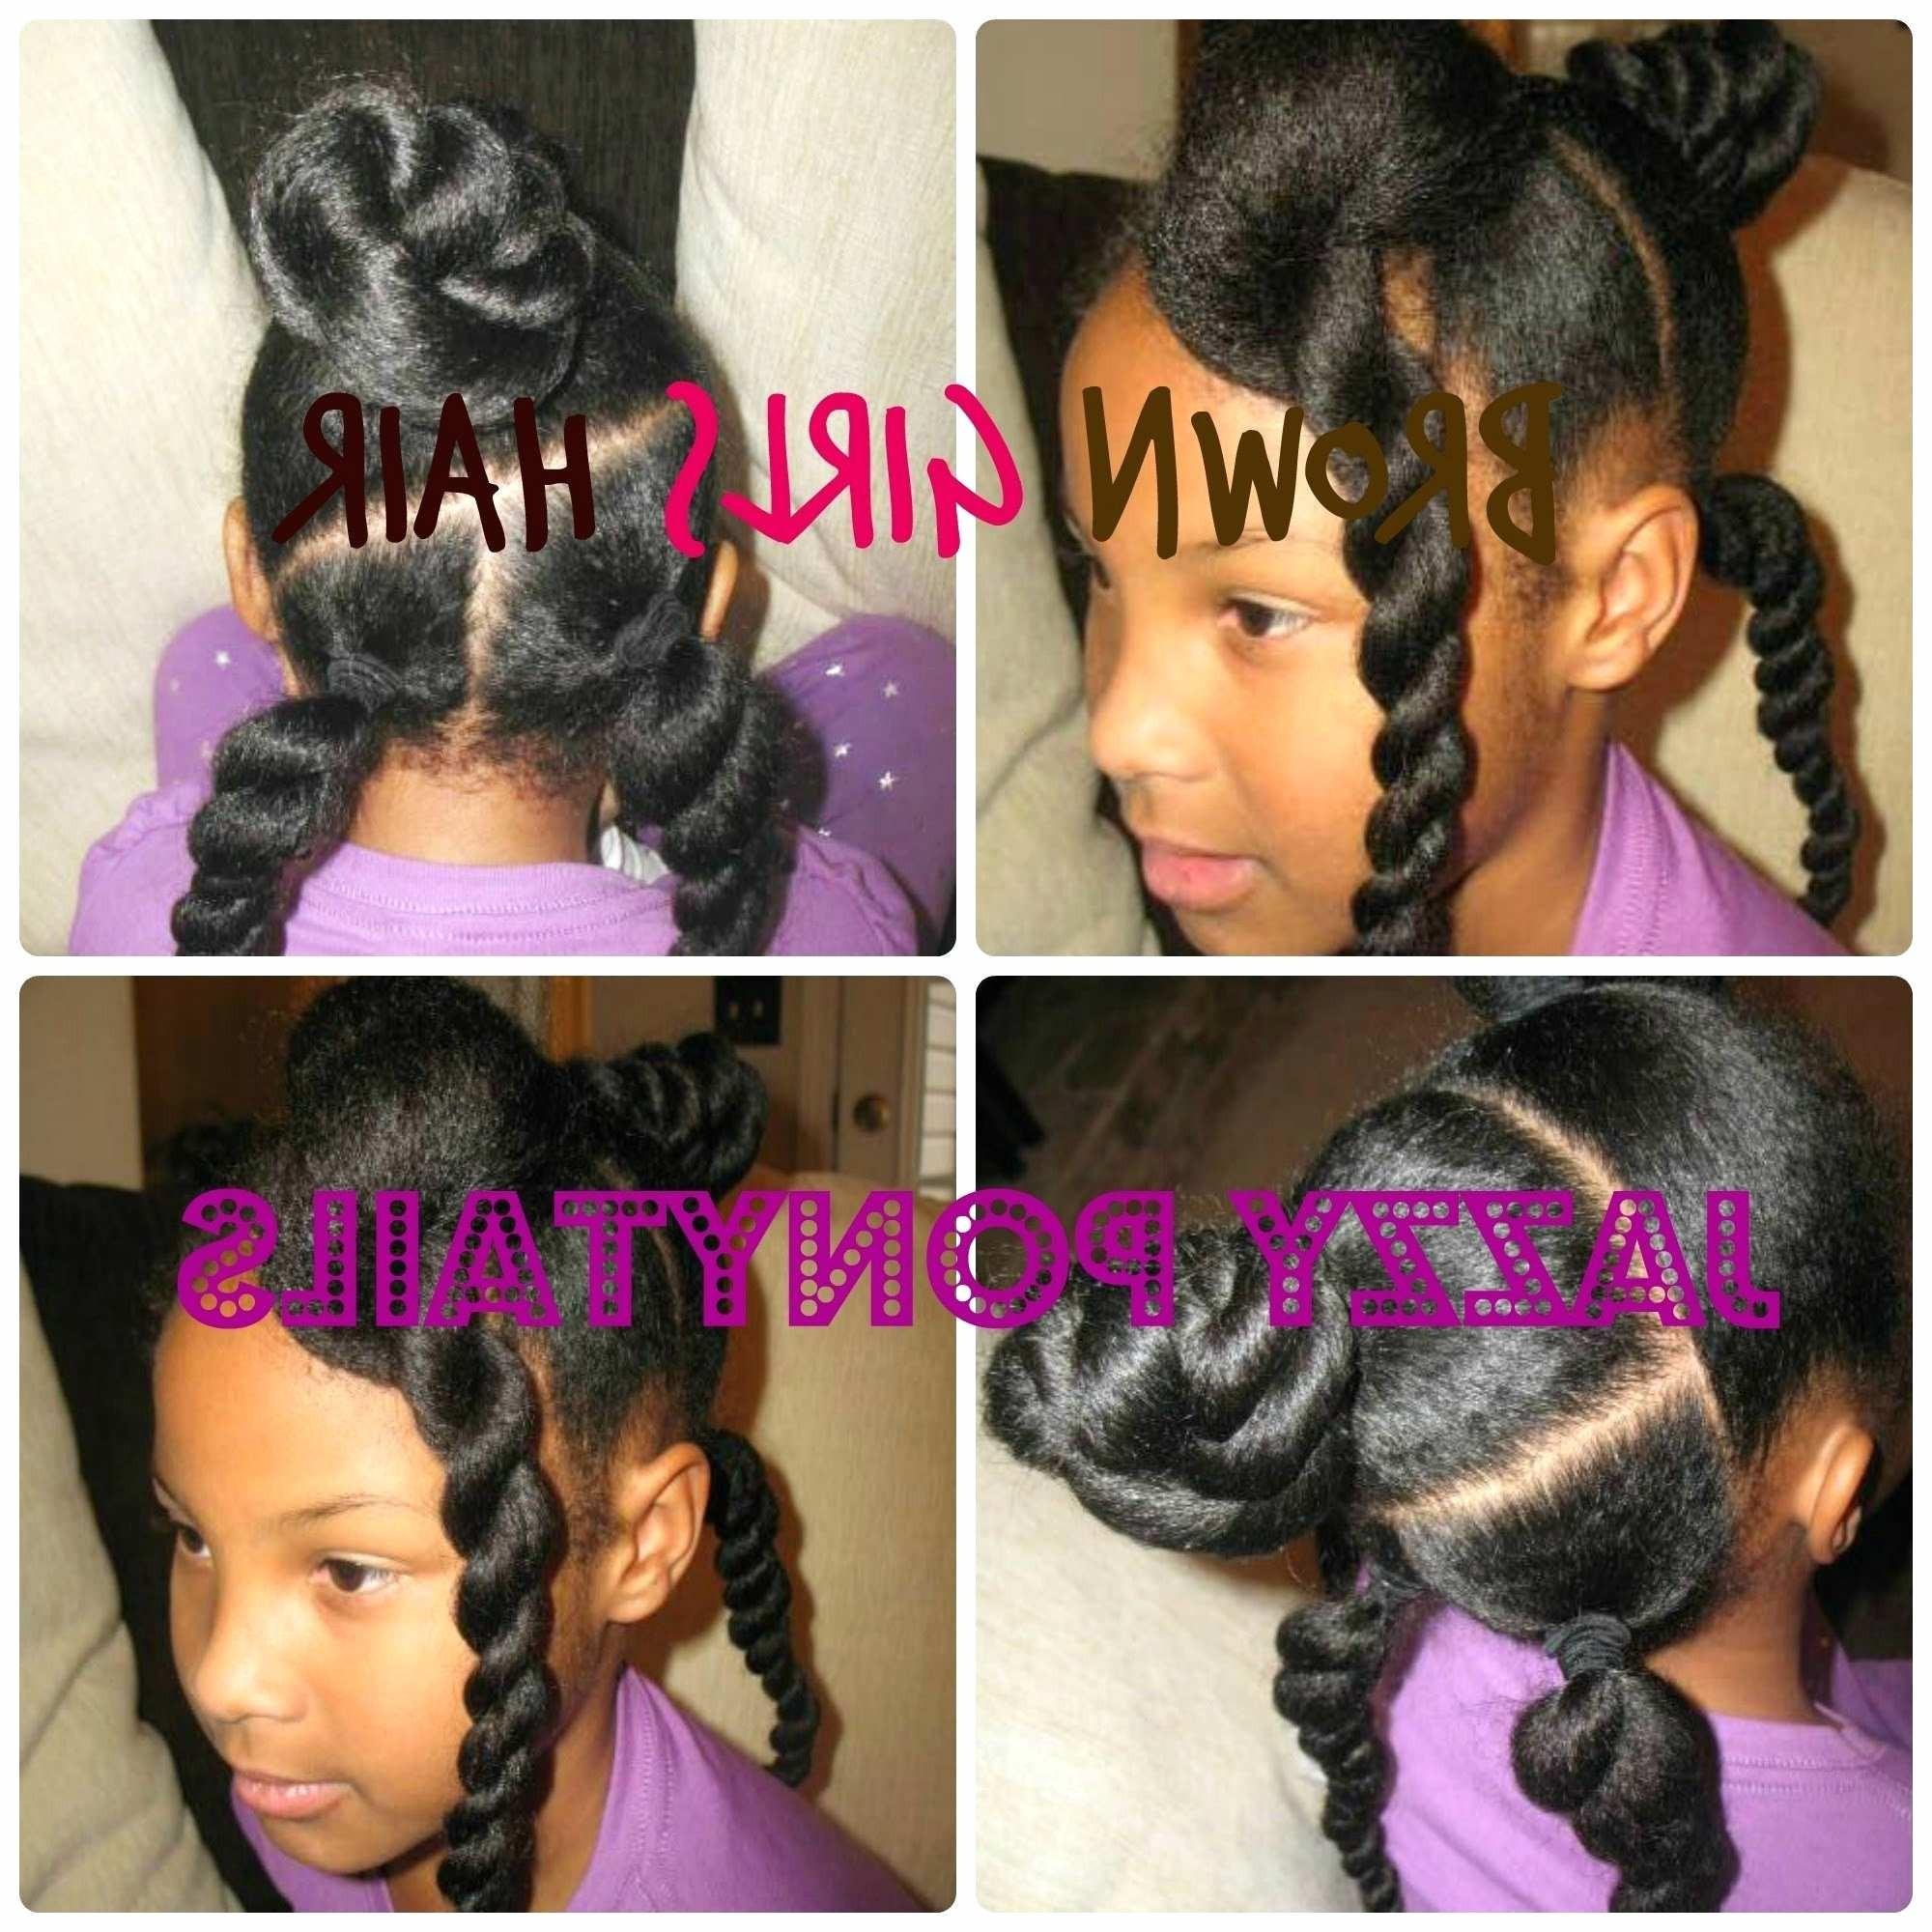 Little Black Girl Ponytail Hairstyles Pics Short Hair Ponytail Styles Unique New Little Black Girl Ponytail